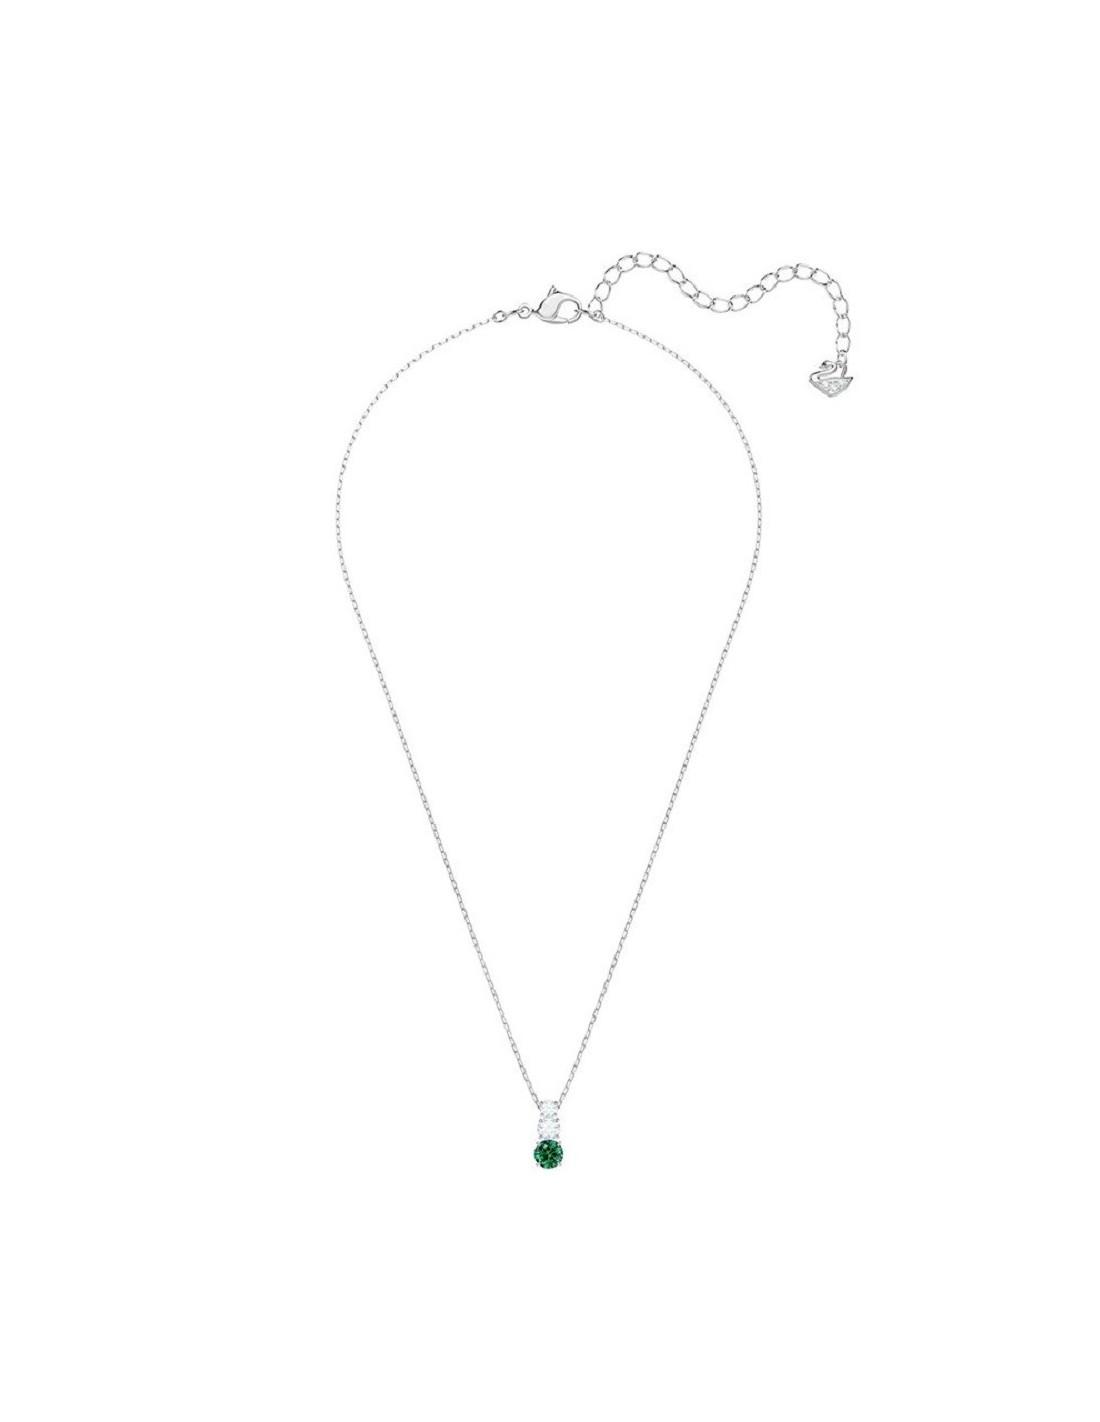 296c09479 ... Attract Necklace Trilogy Round Swarovski jewelry green rhodium plating  5416153. Previous